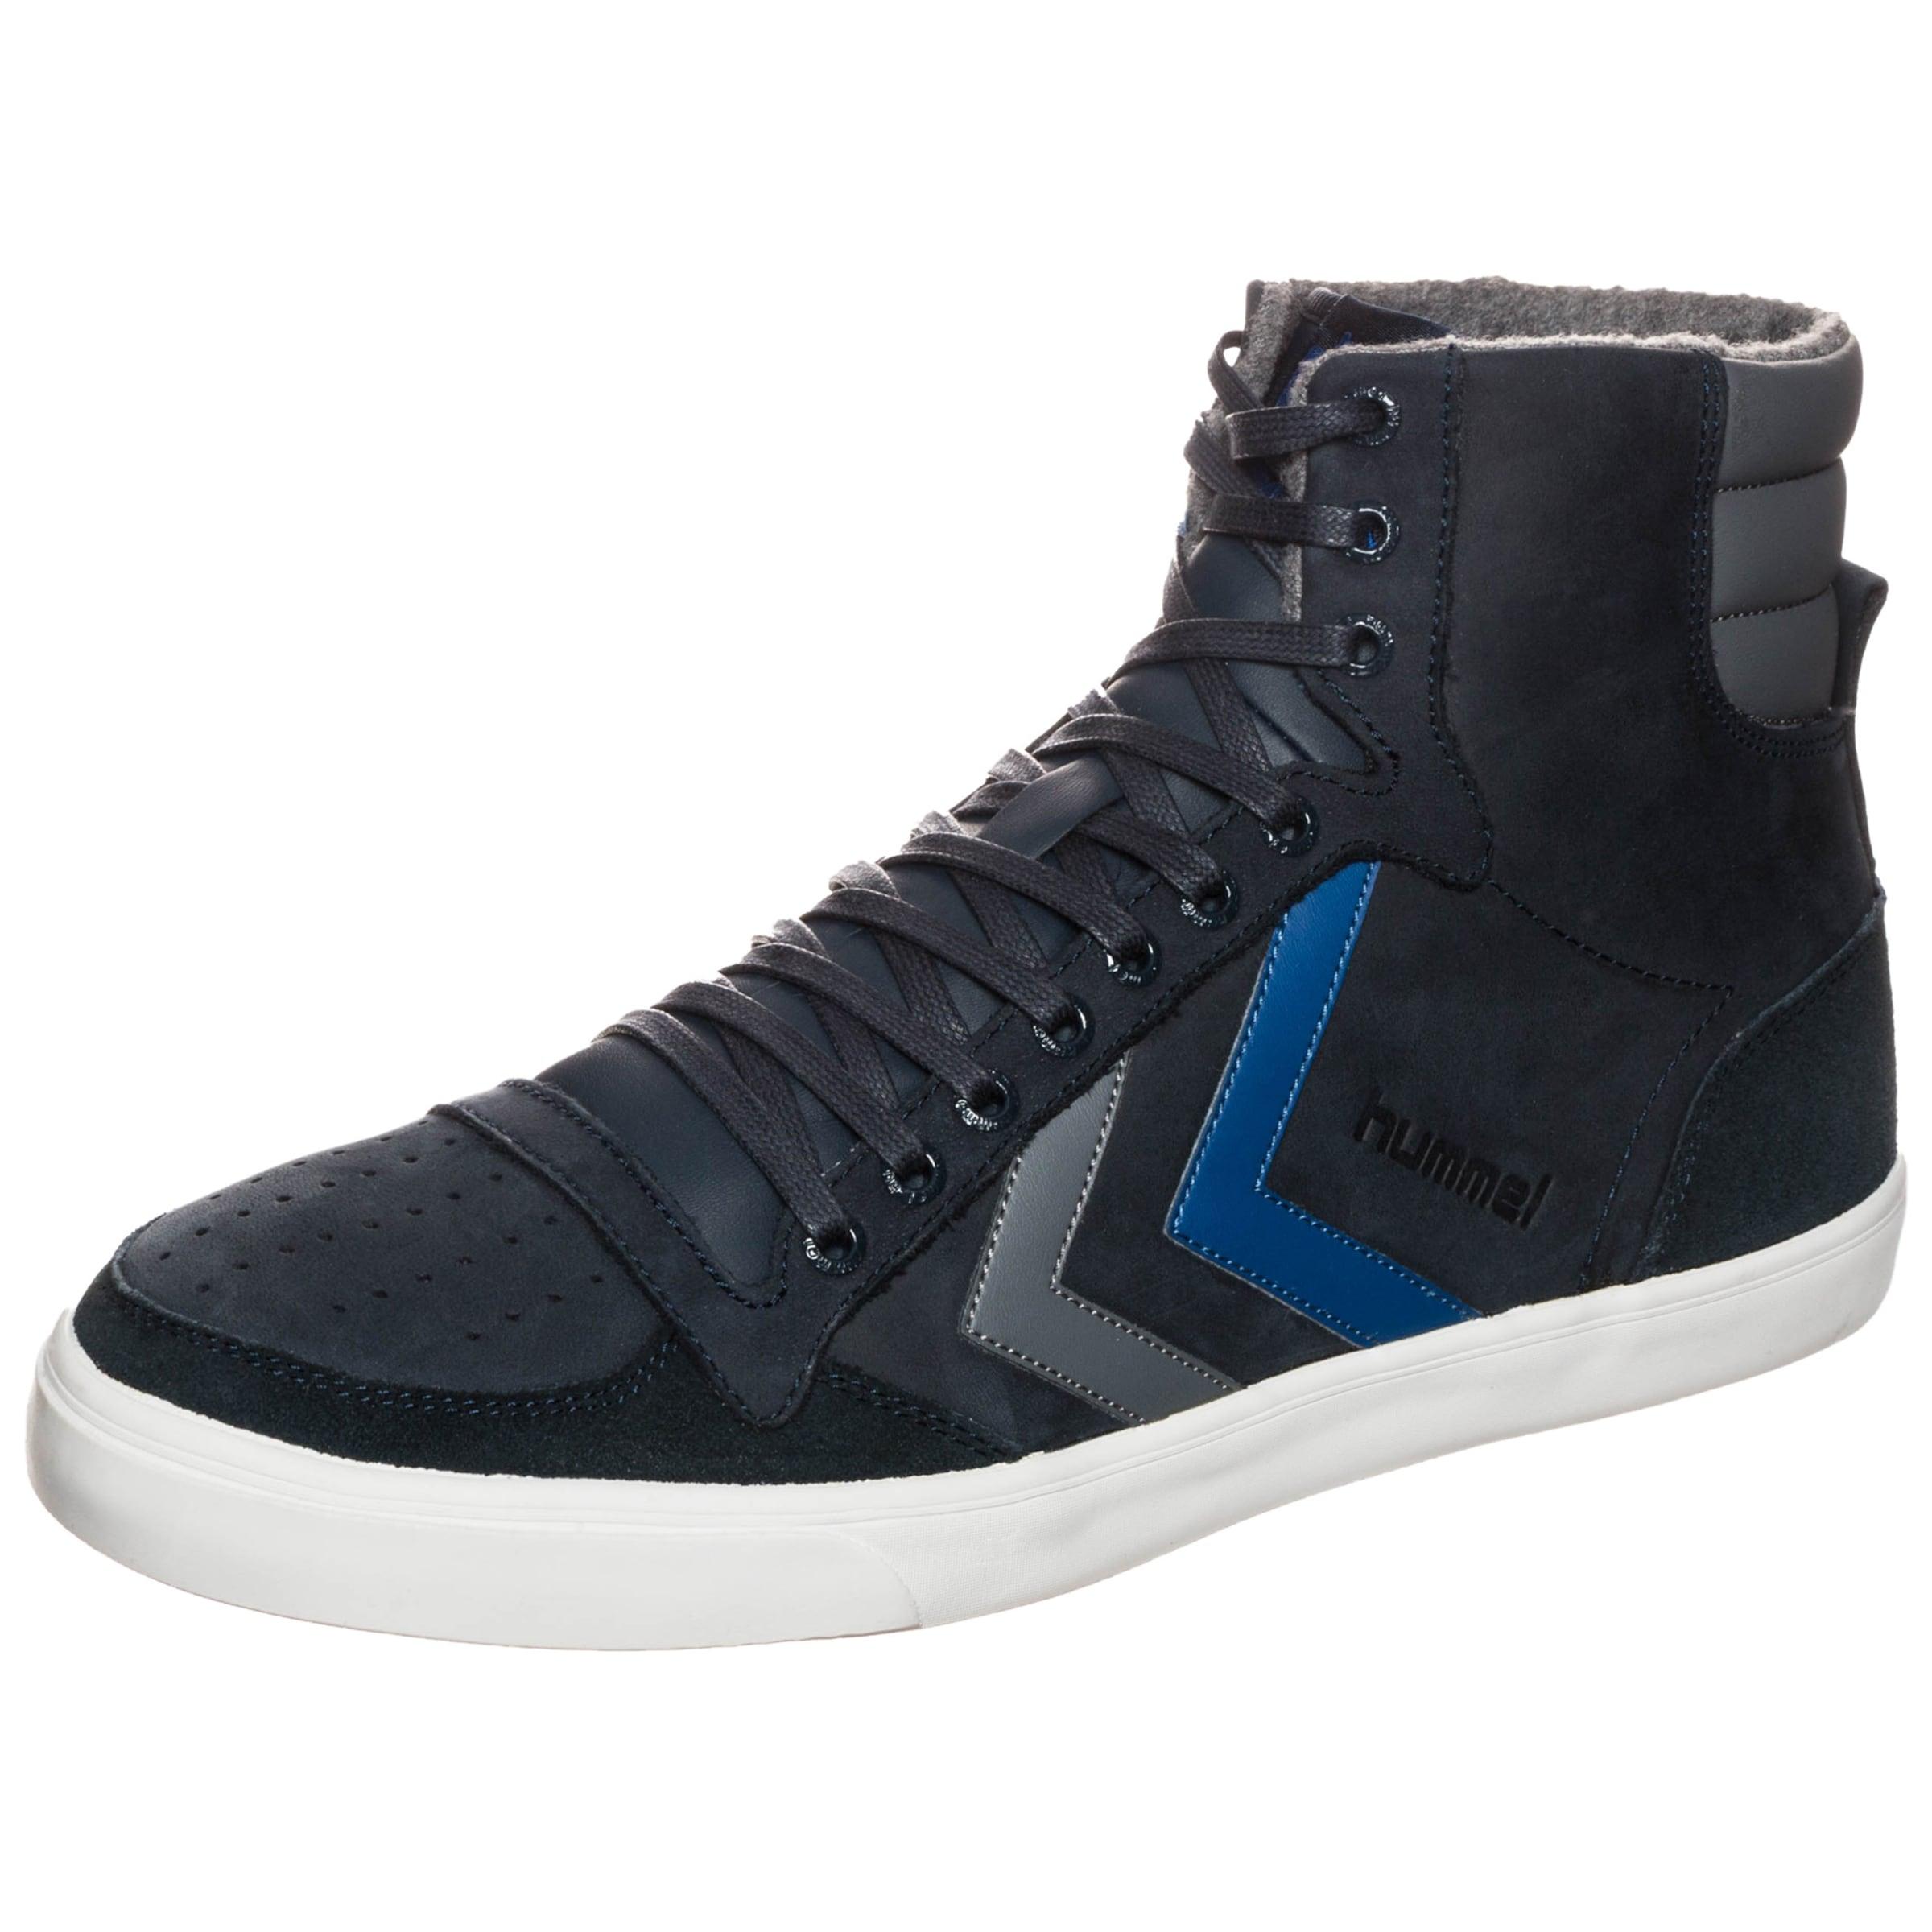 Hummel Sneaker Slimmer Stadil Duo Oiled High